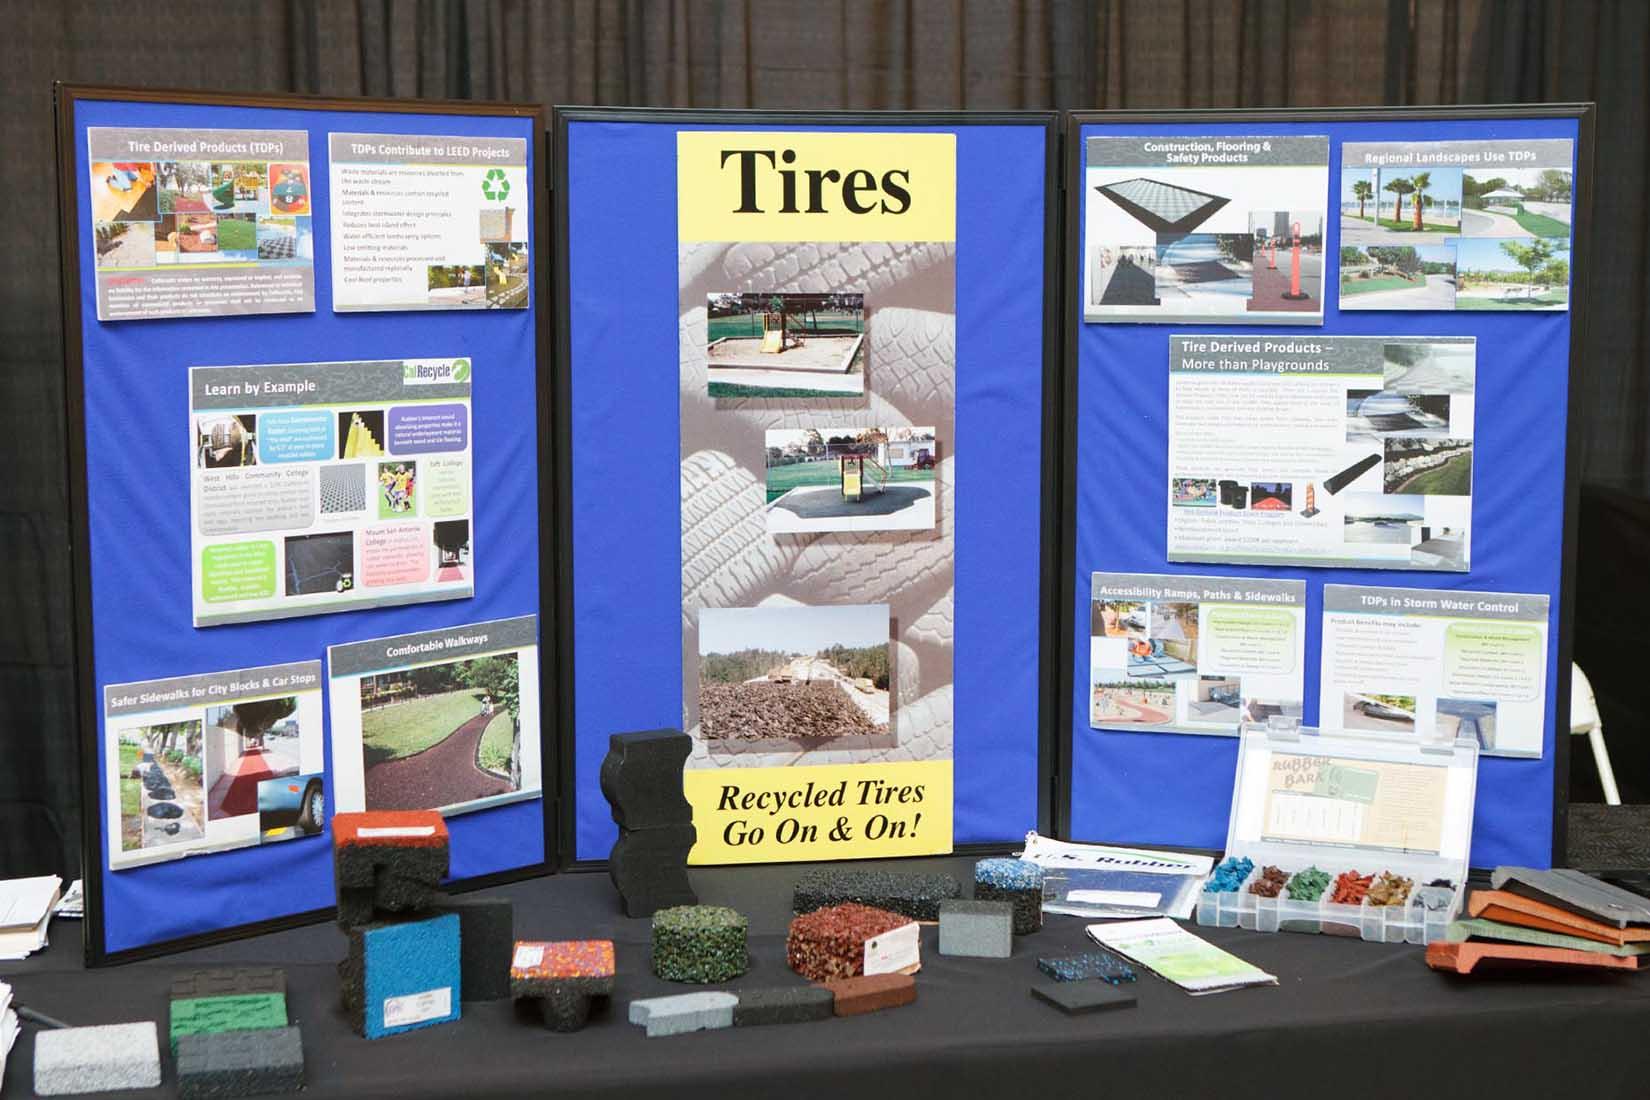 vendor display of tires